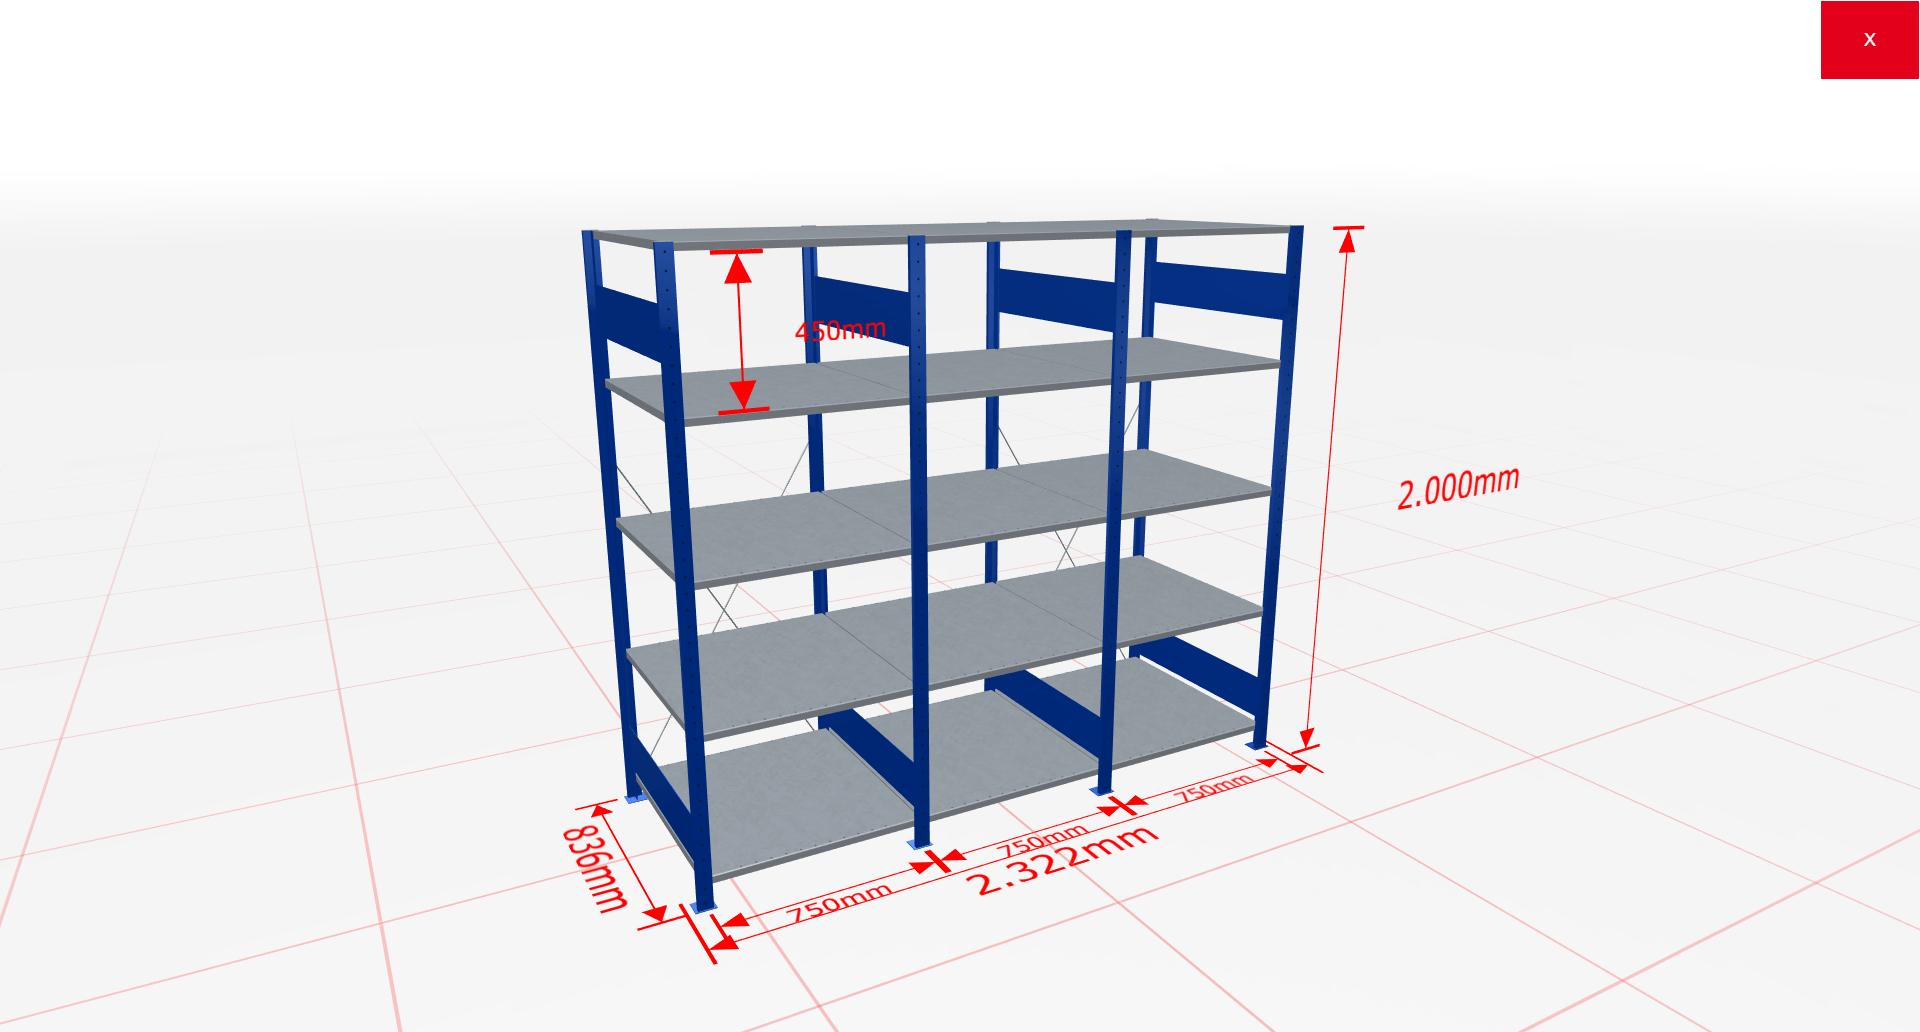 Fachbodenregal Komplettregal 2000x2322x800 mm (HxBxT) SCHULTE Lagertechnik blau 5 Ebenen  150 kg je Boden